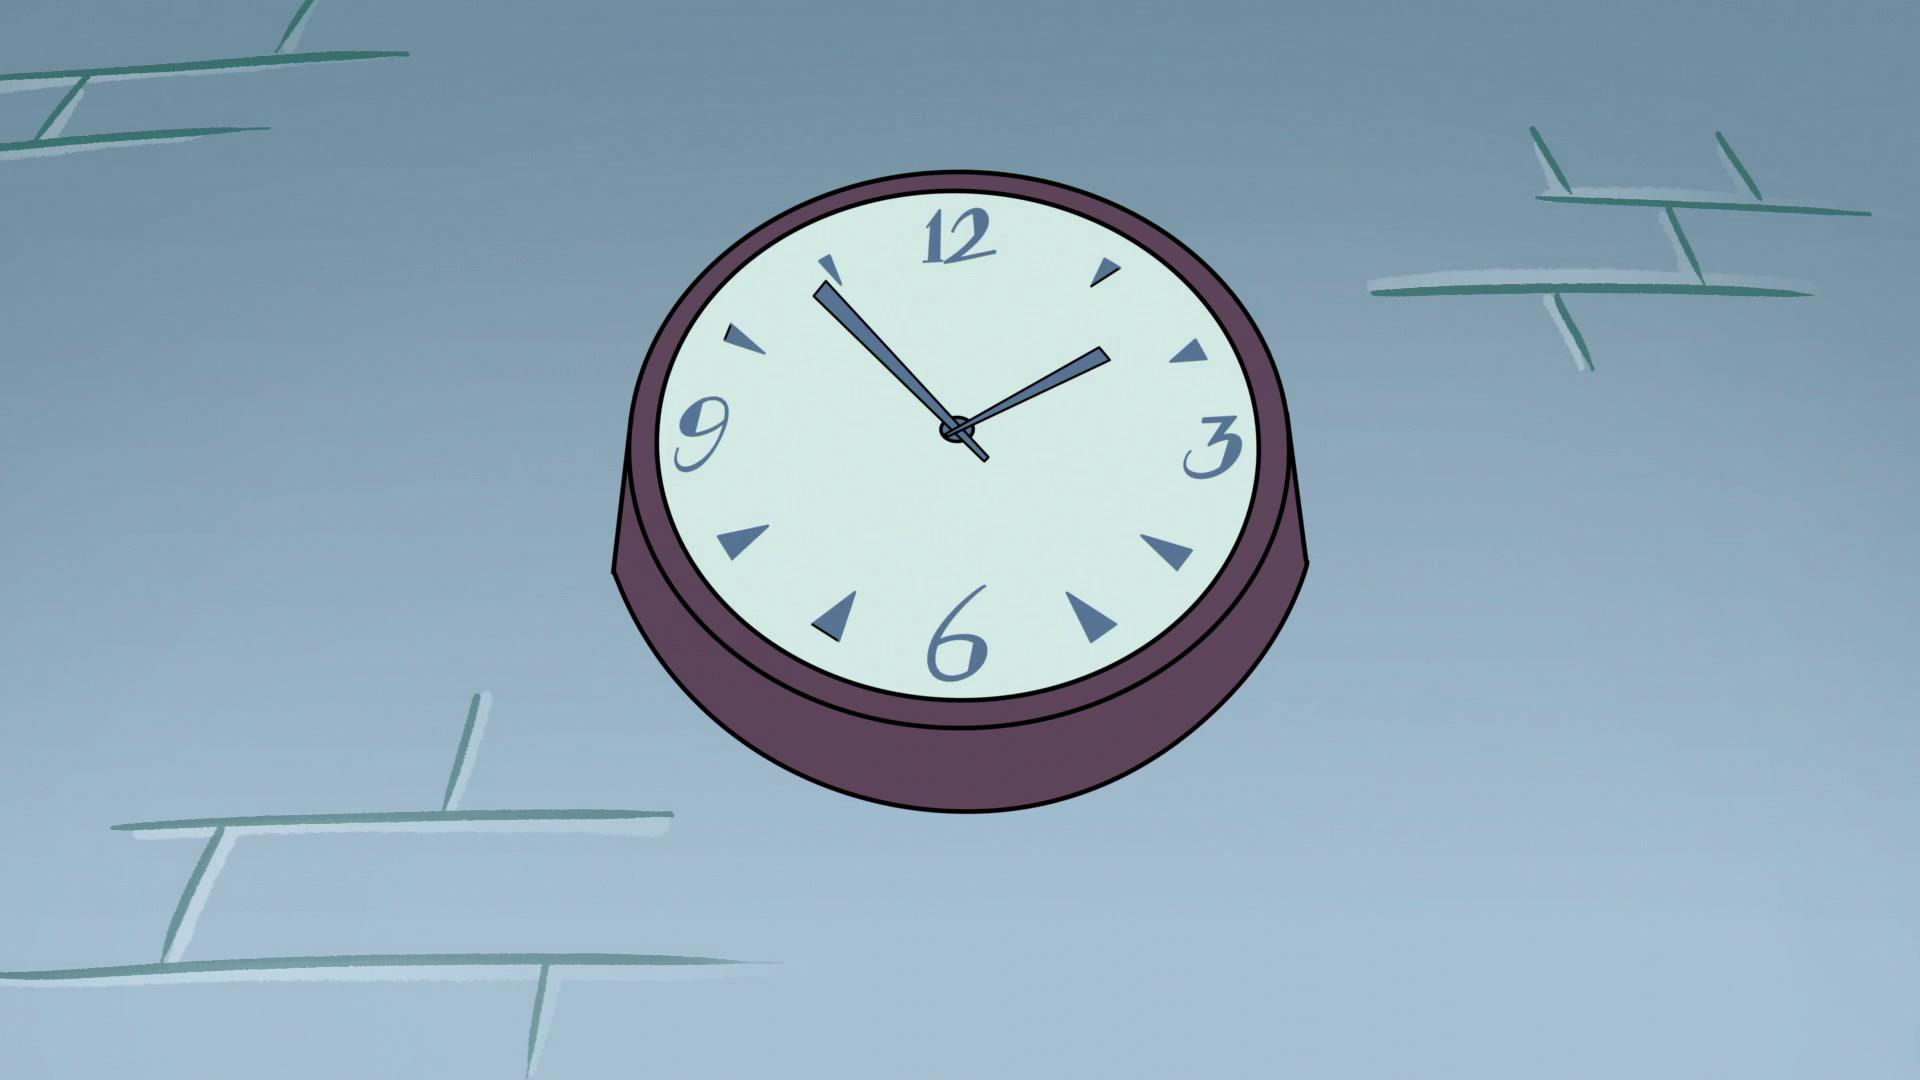 Image s2e32 clock on the classroom wallg star vs the s2e32 clock on the classroom wallg amipublicfo Gallery